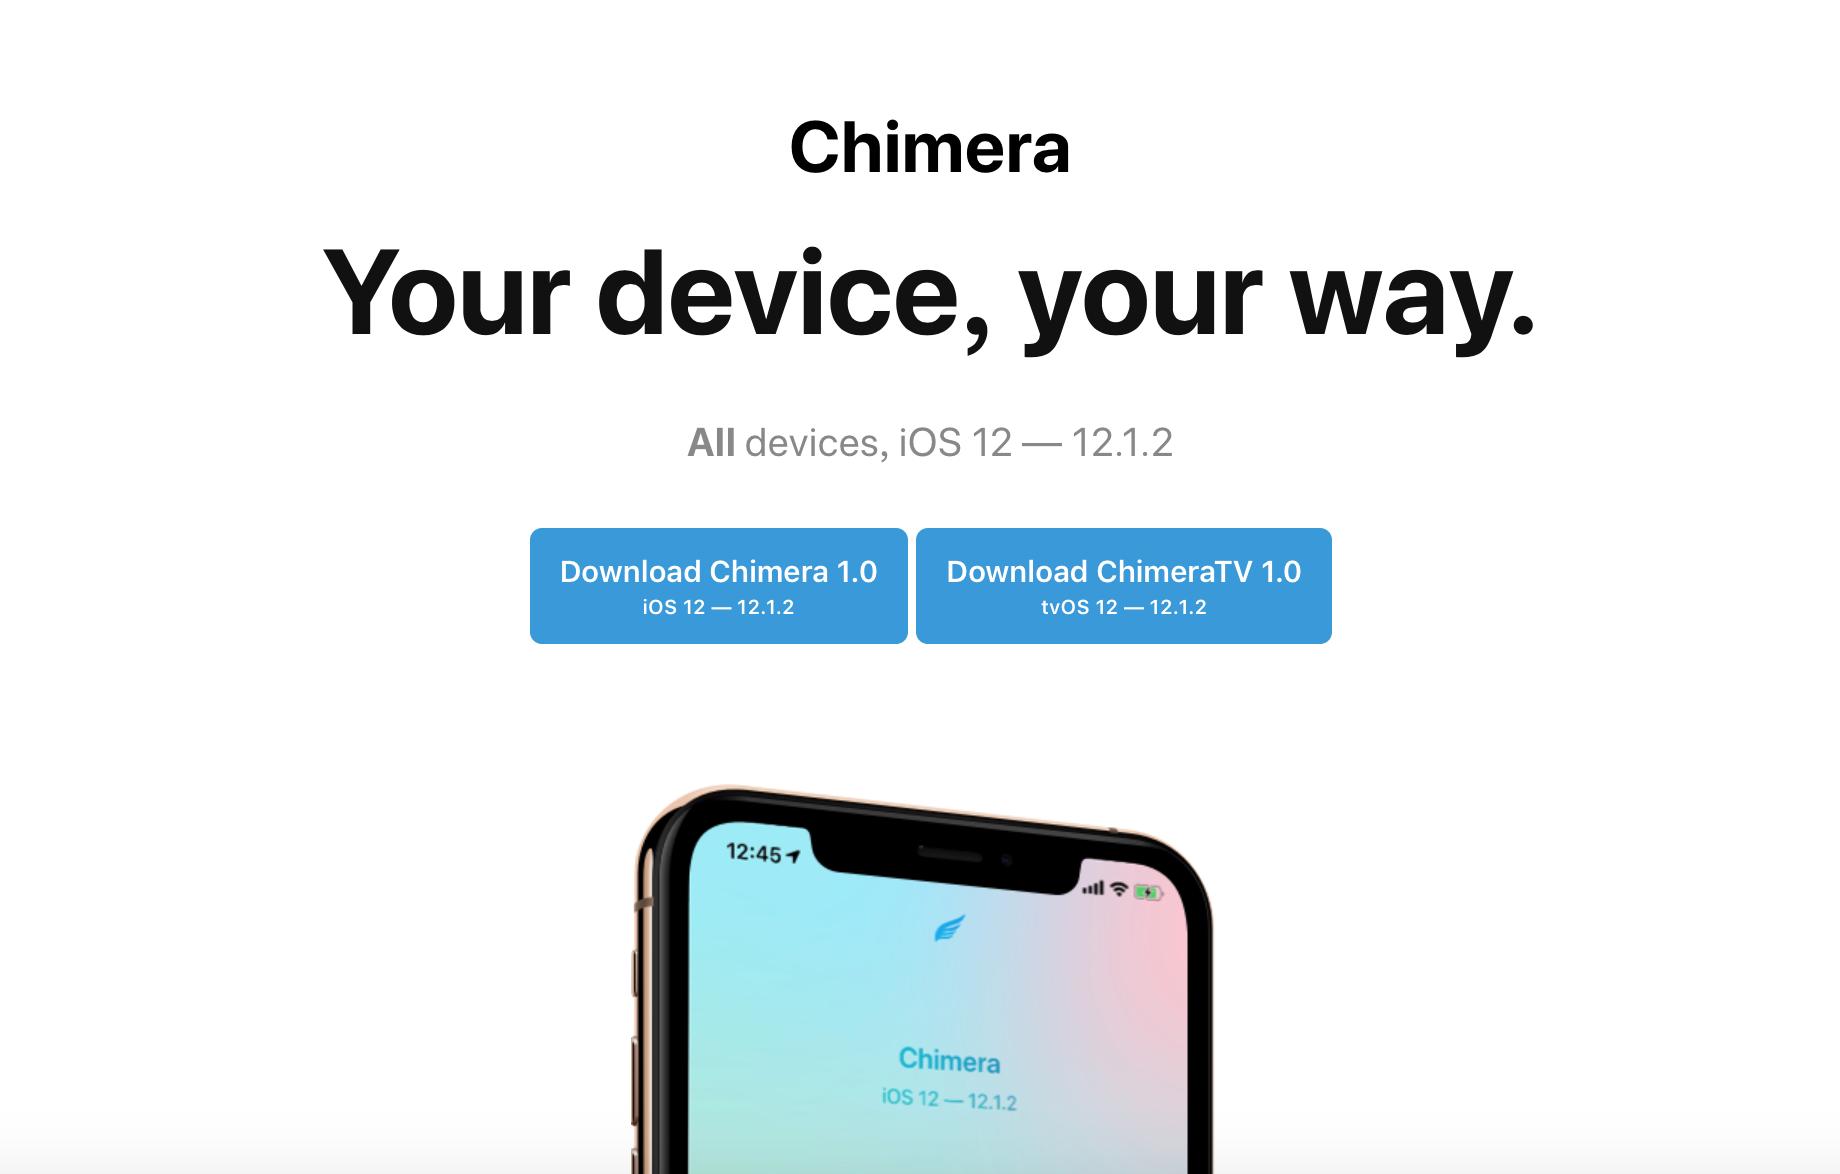 Chimera越狱工具发布,支持iOS12~iOS12.1.2 全体设备包括A12 Xs XsMax Xr